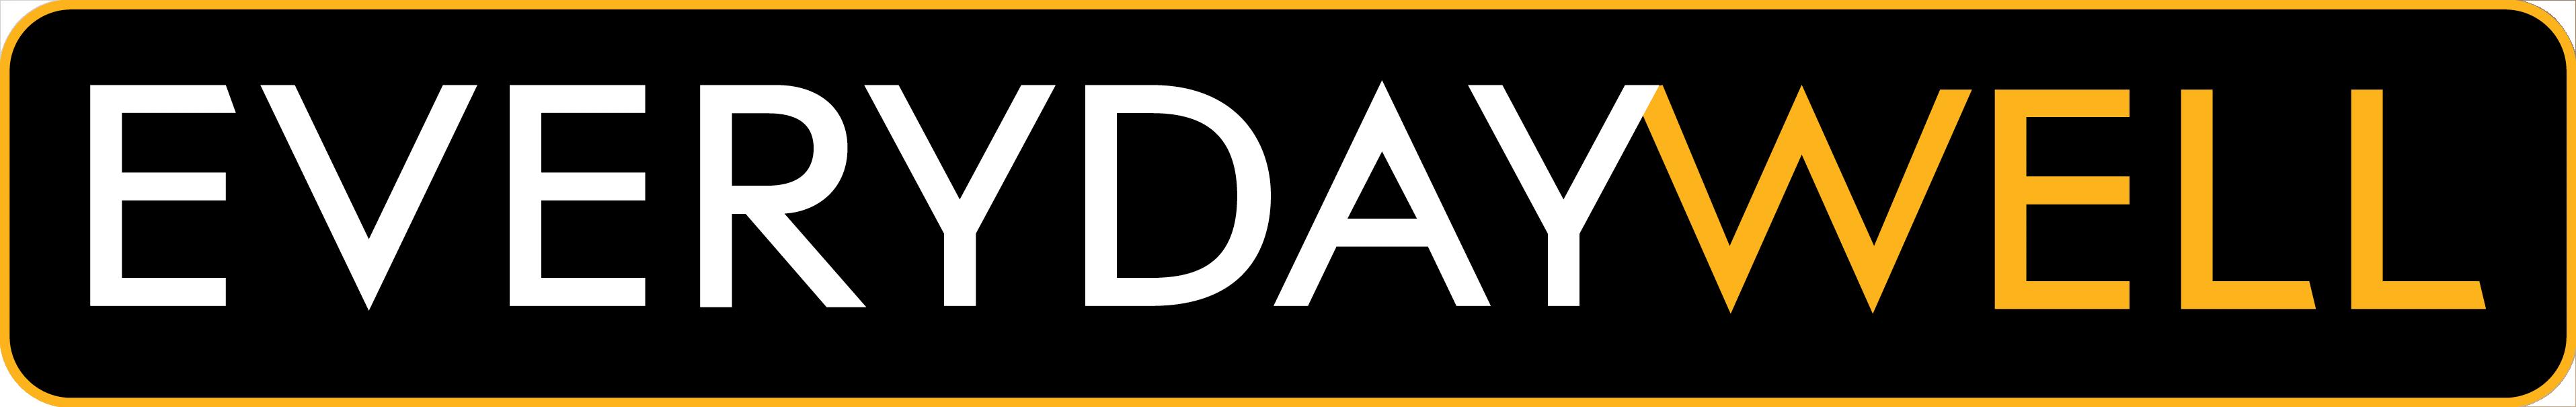 everydaywell logo